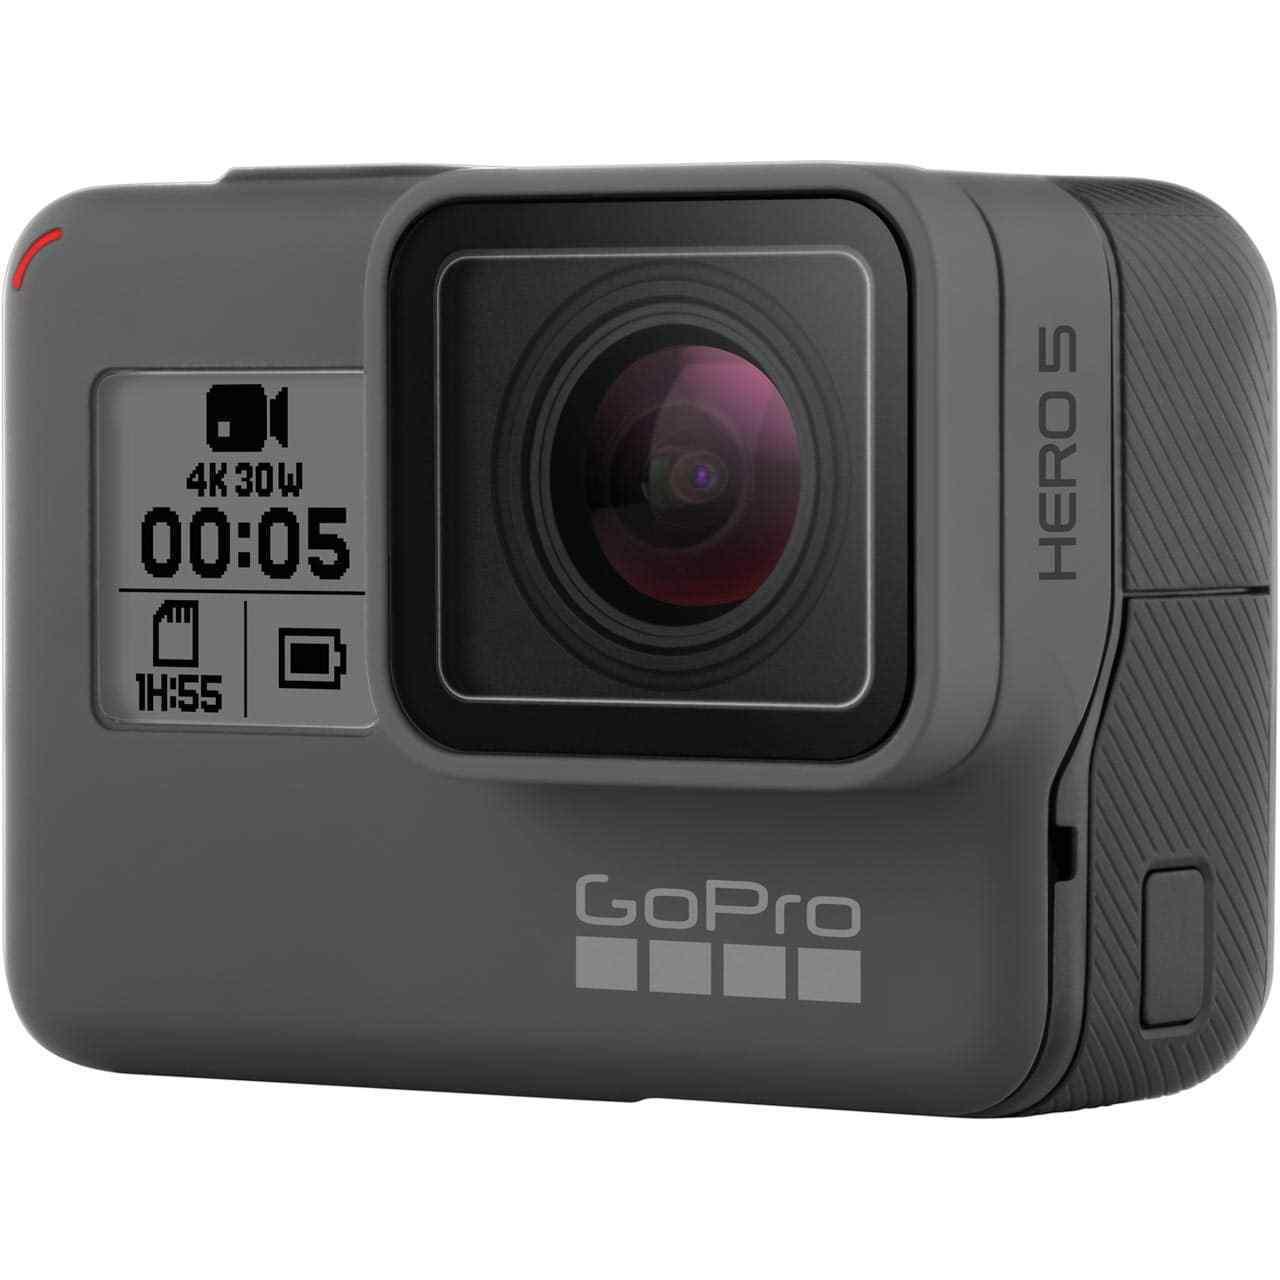 GoPro Hero5 CHDHX-502 Black Activity Digicam Water-resistant Brand-new